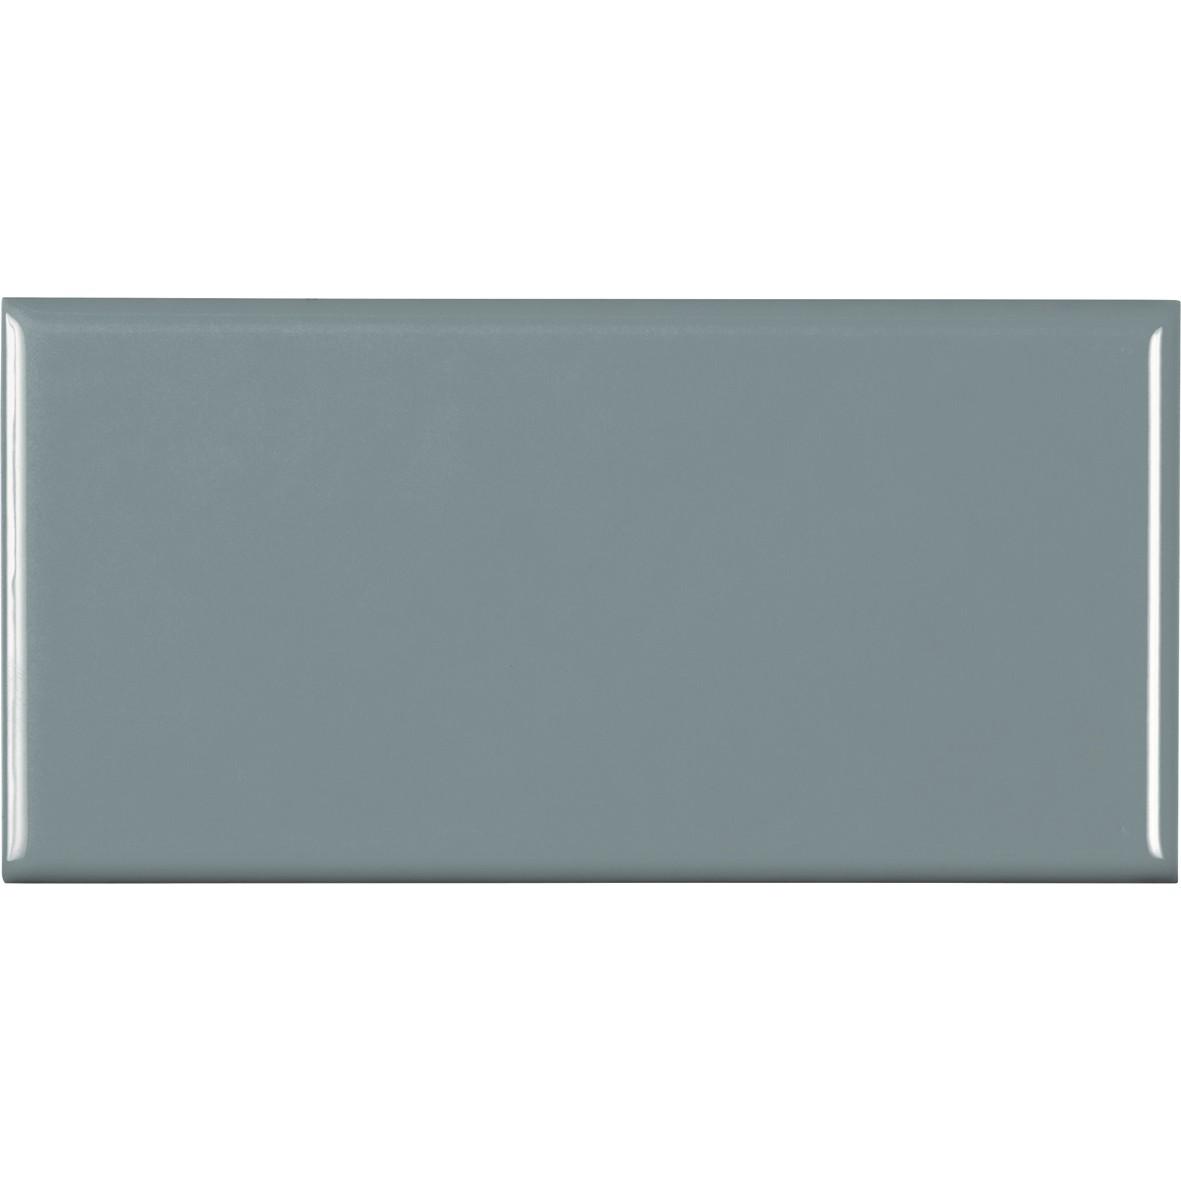 Revestimento Brilhante Paris Lilac Gris Tipo A 10x20 cm 037 m Cinza claro - Portobello